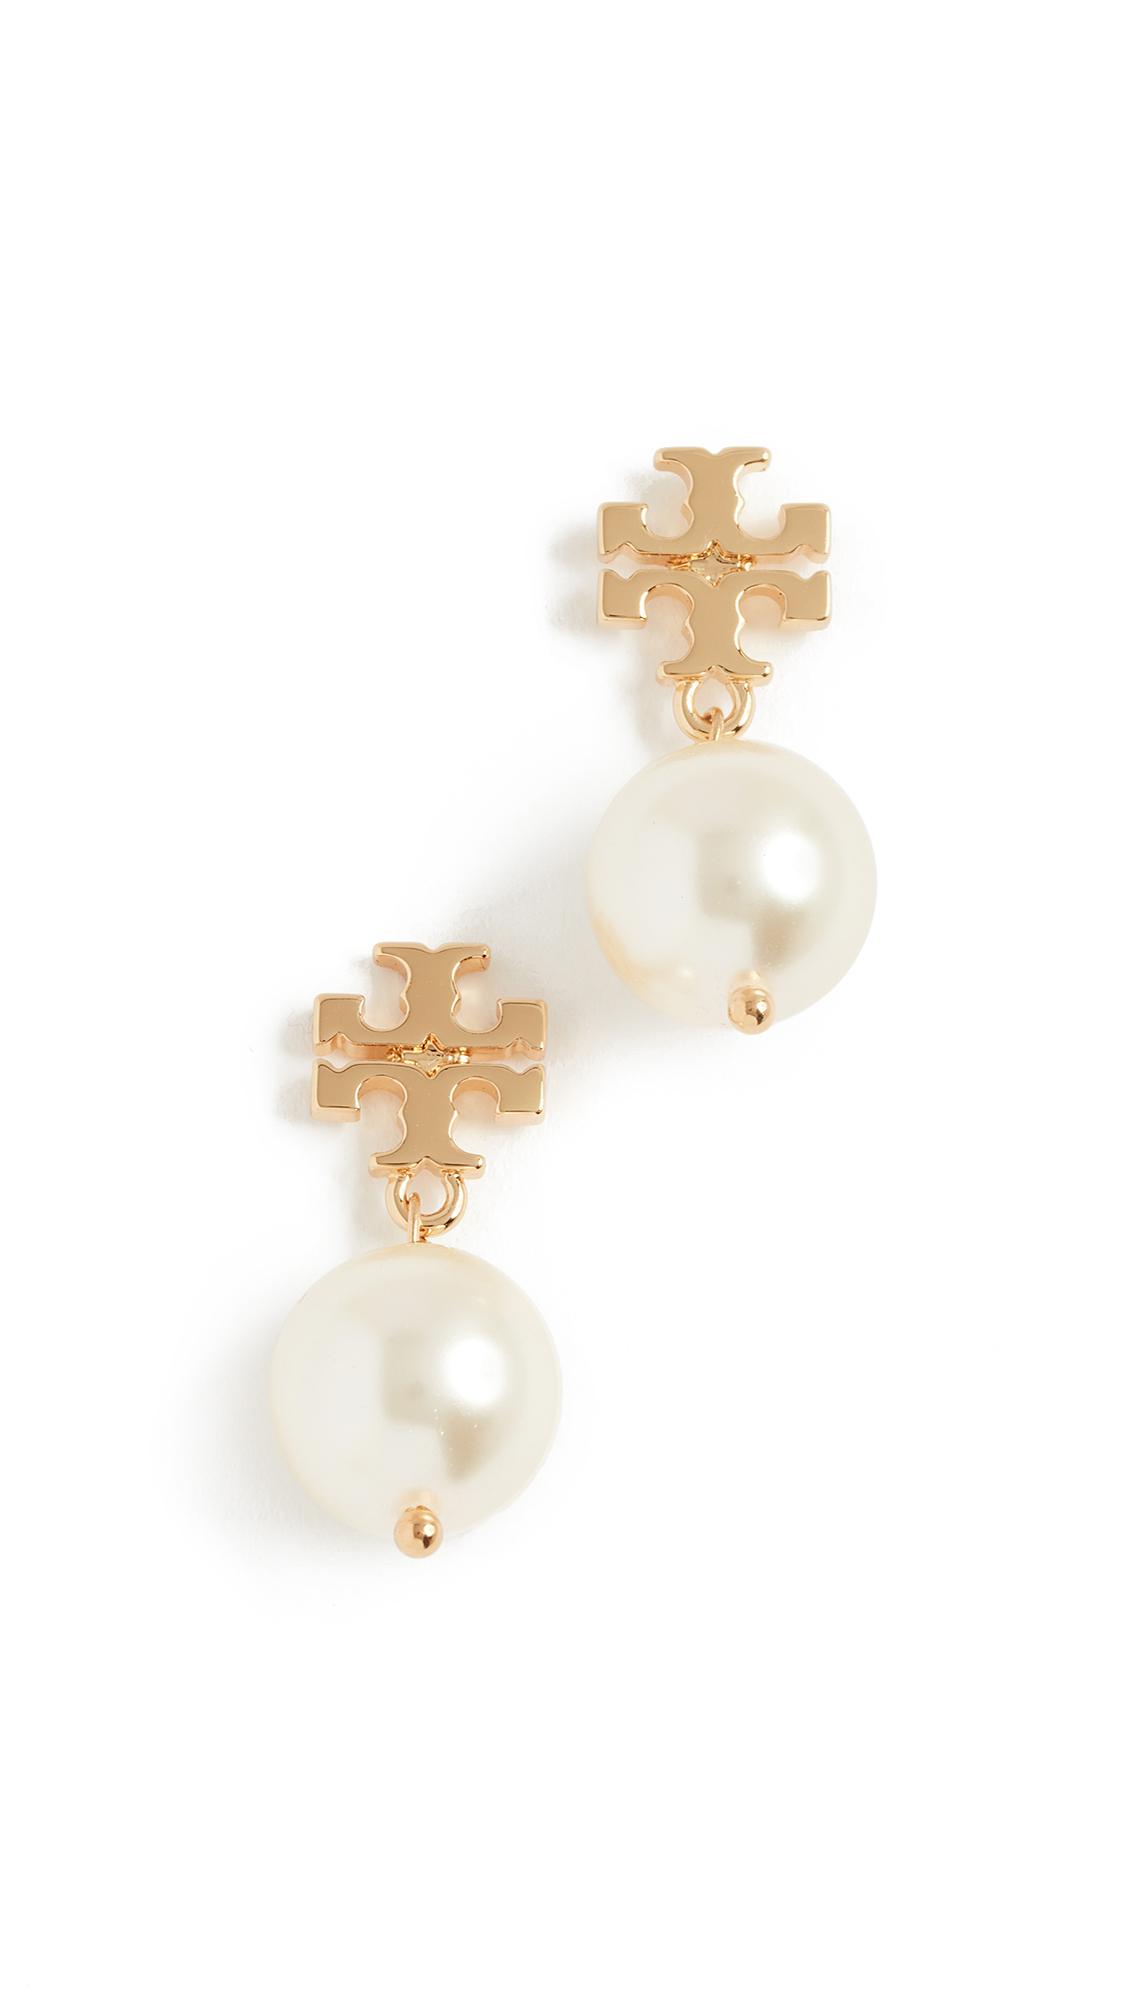 Tory Burch Swarovski Crystal Imitation Pearl Drop Earrings - Ivory/Shiny Gold